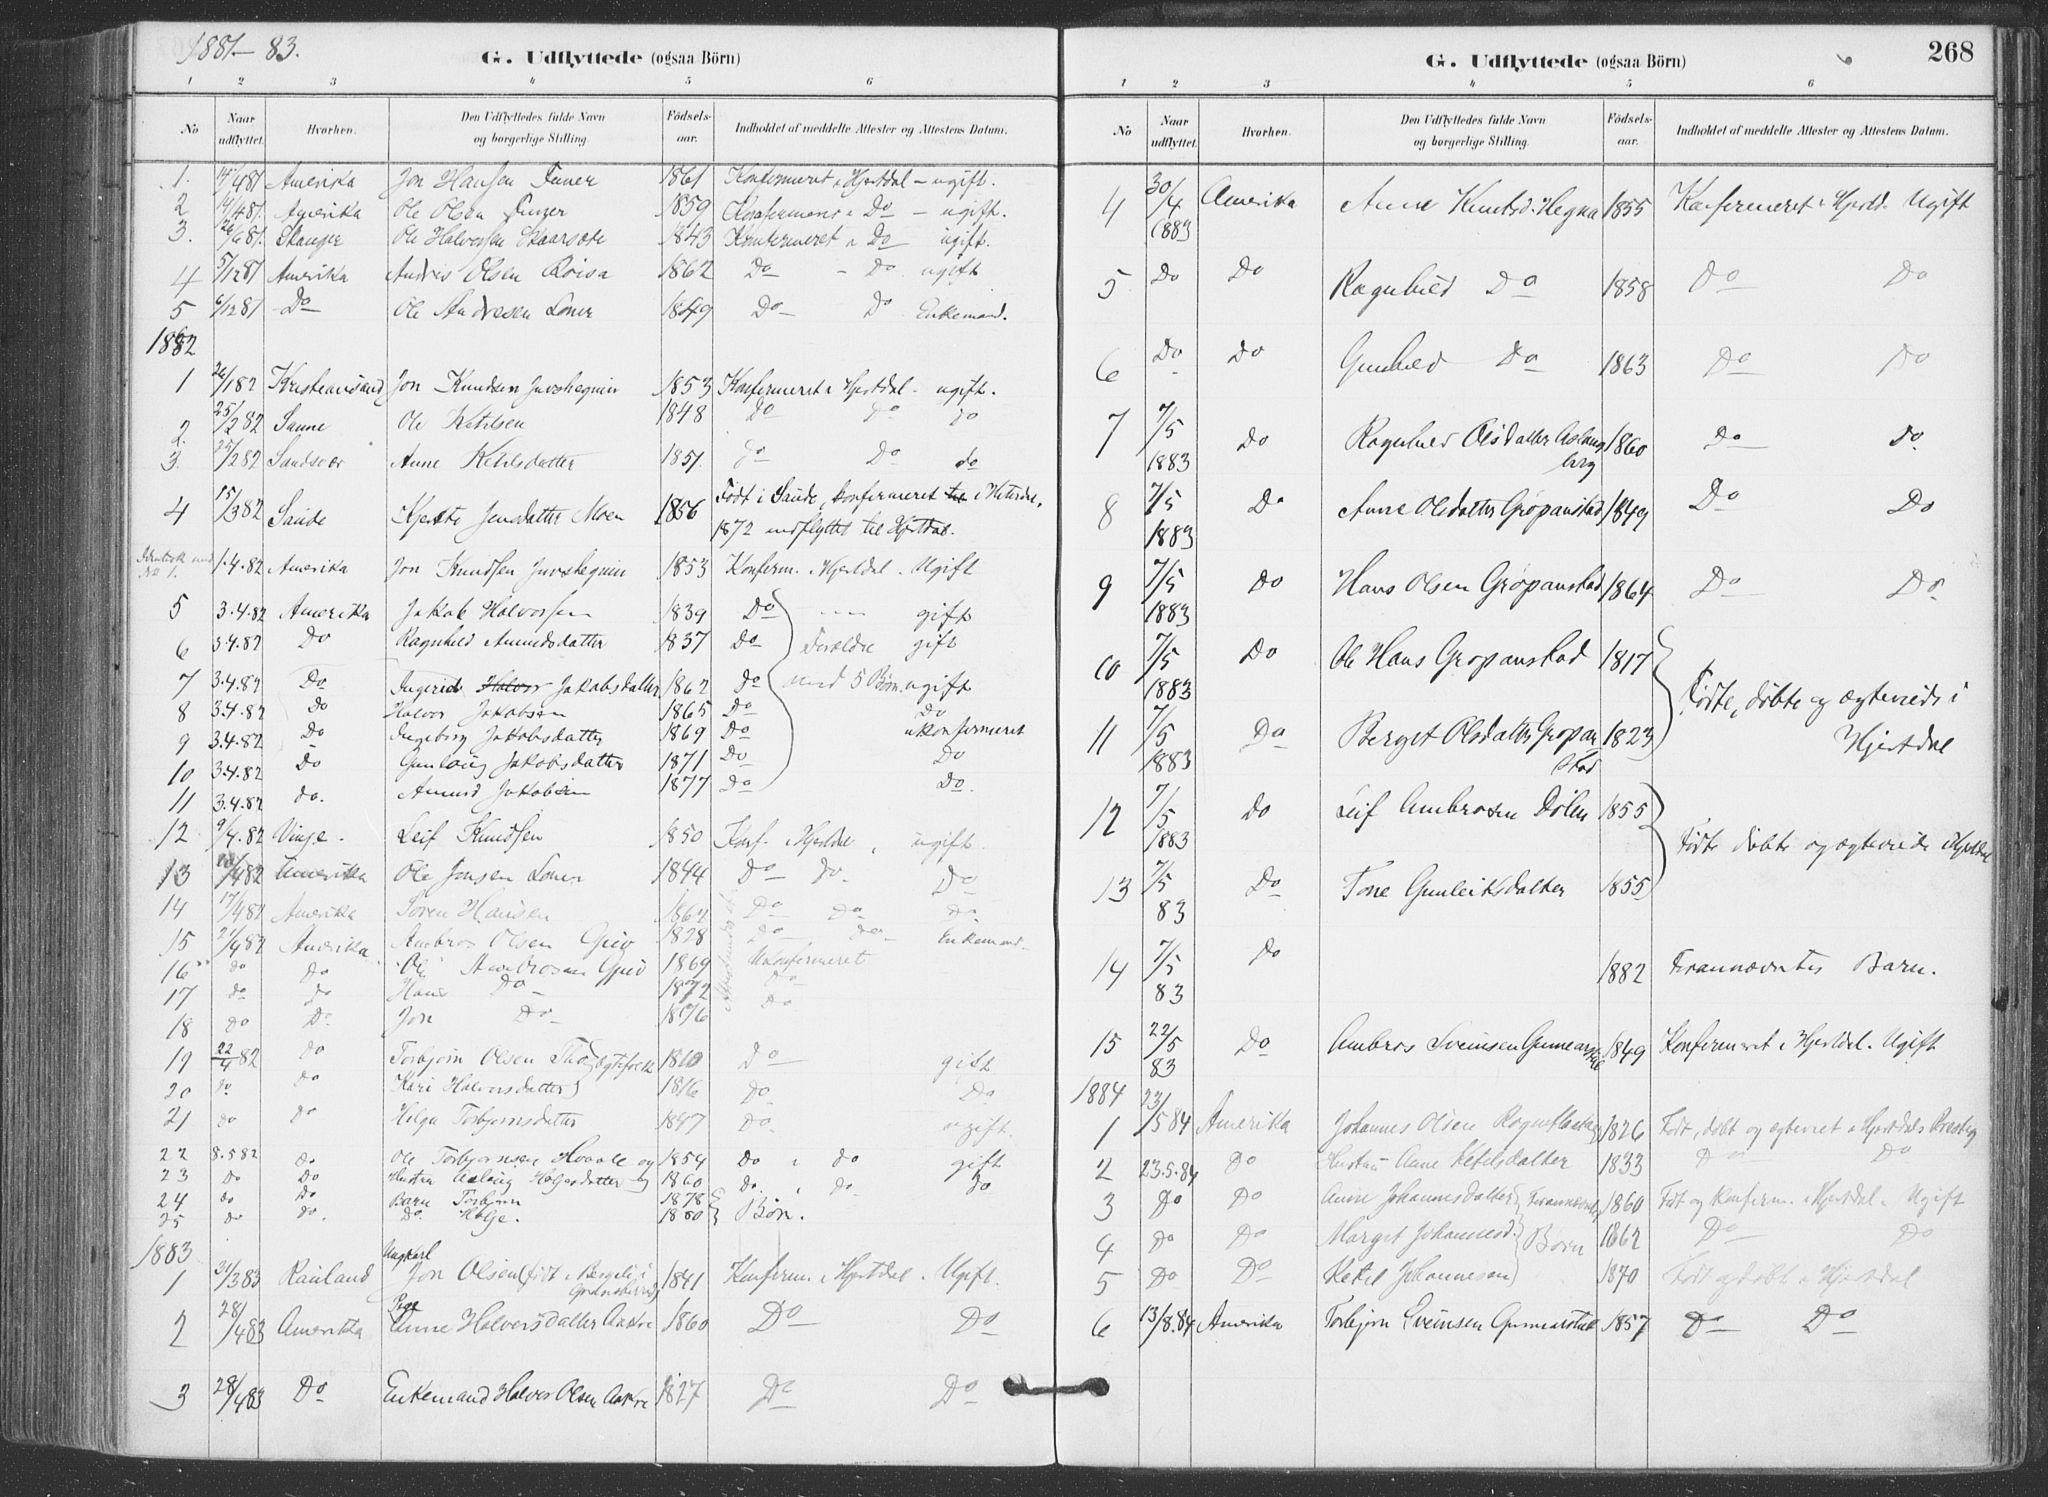 SAKO, Hjartdal kirkebøker, F/Fa/L0010: Ministerialbok nr. I 10, 1880-1929, s. 268